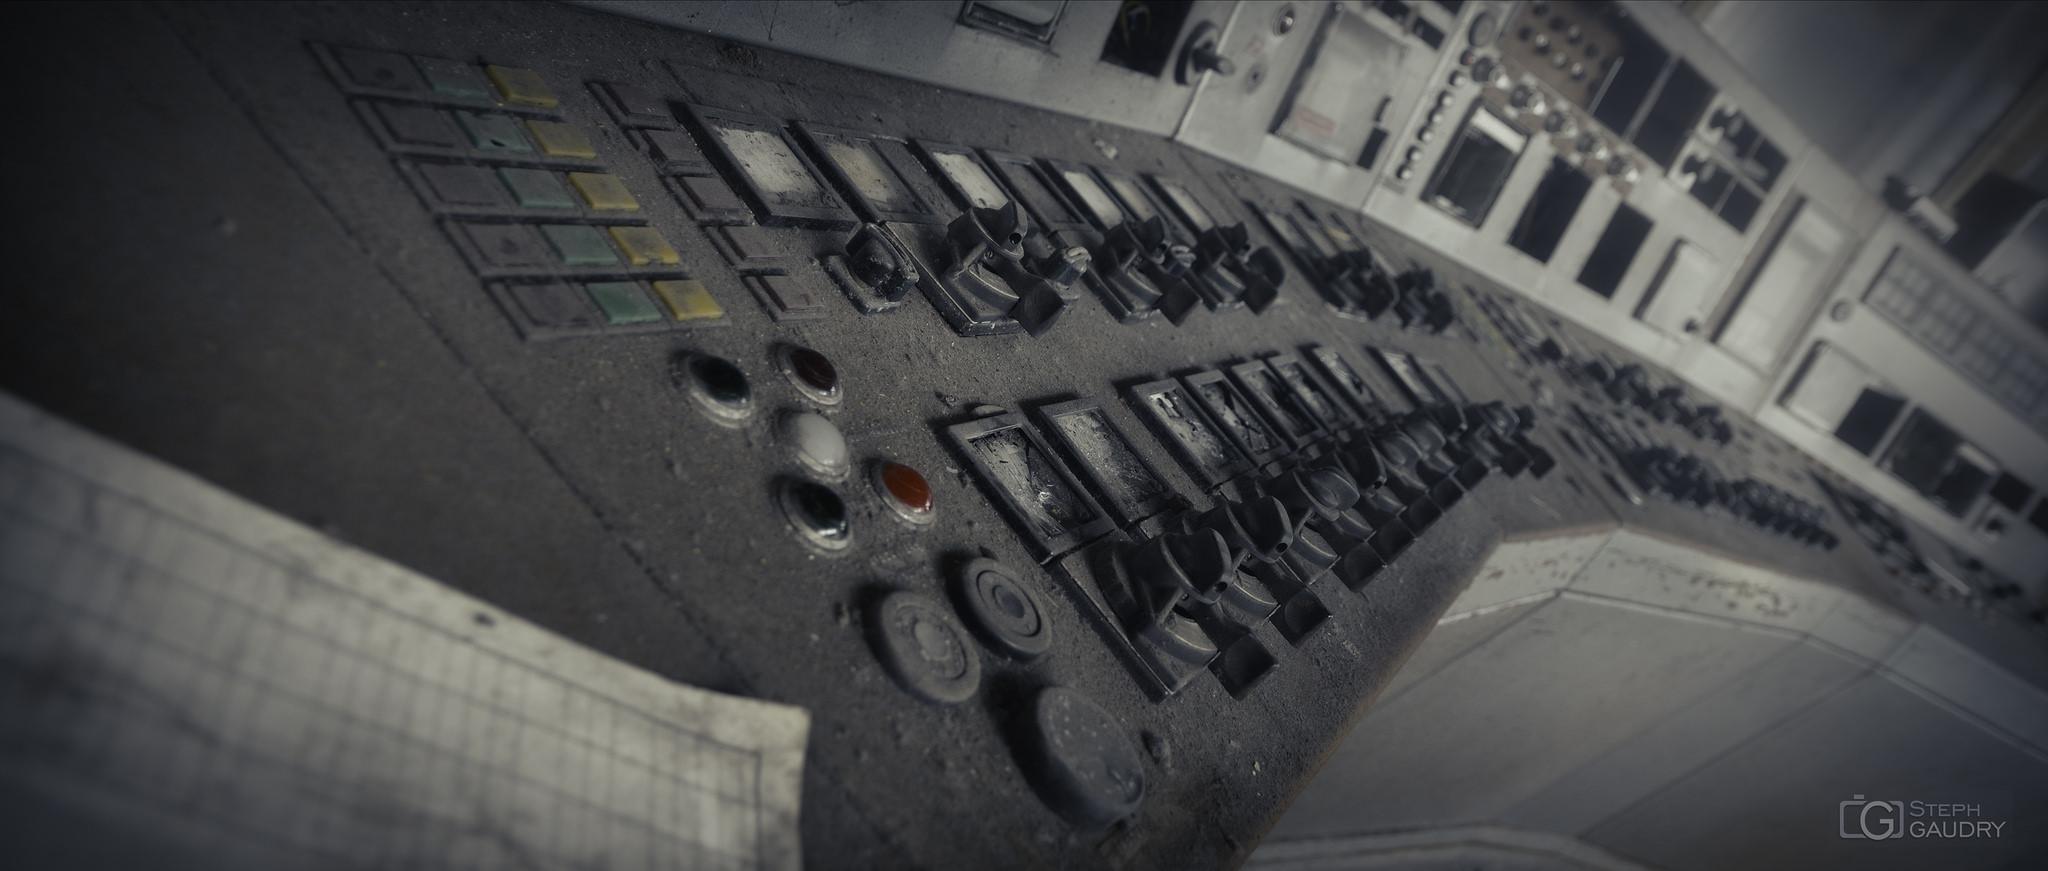 ECVB : lillte grey control room [Click to start slideshow]